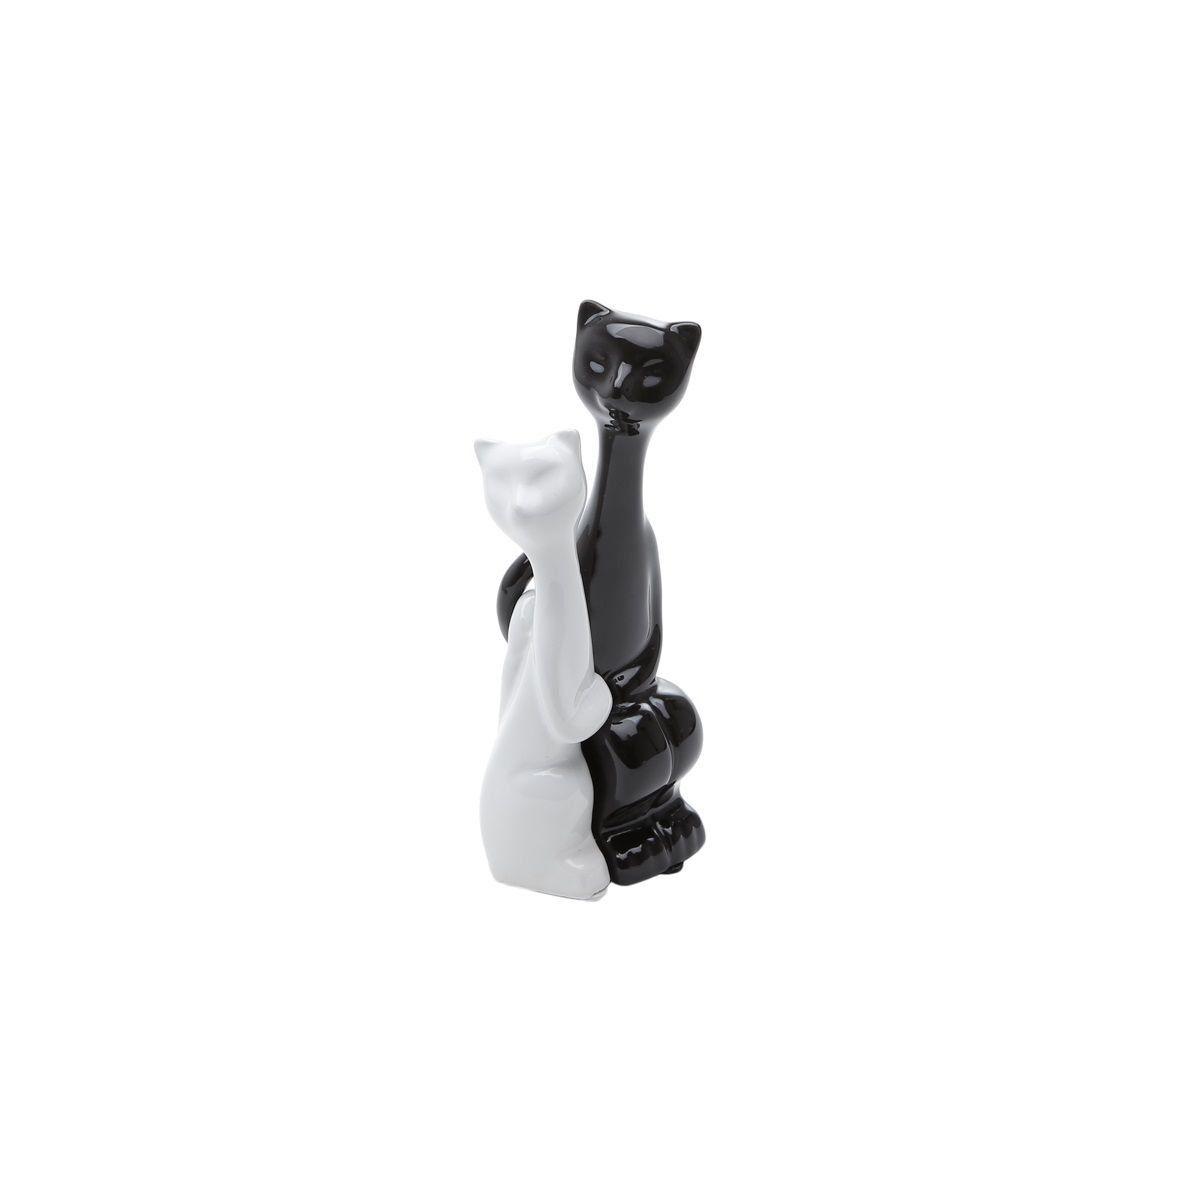 Estatueta 19 cm de cerâmica branco e preto Casal Gatos Amorosos Prestige - 2796